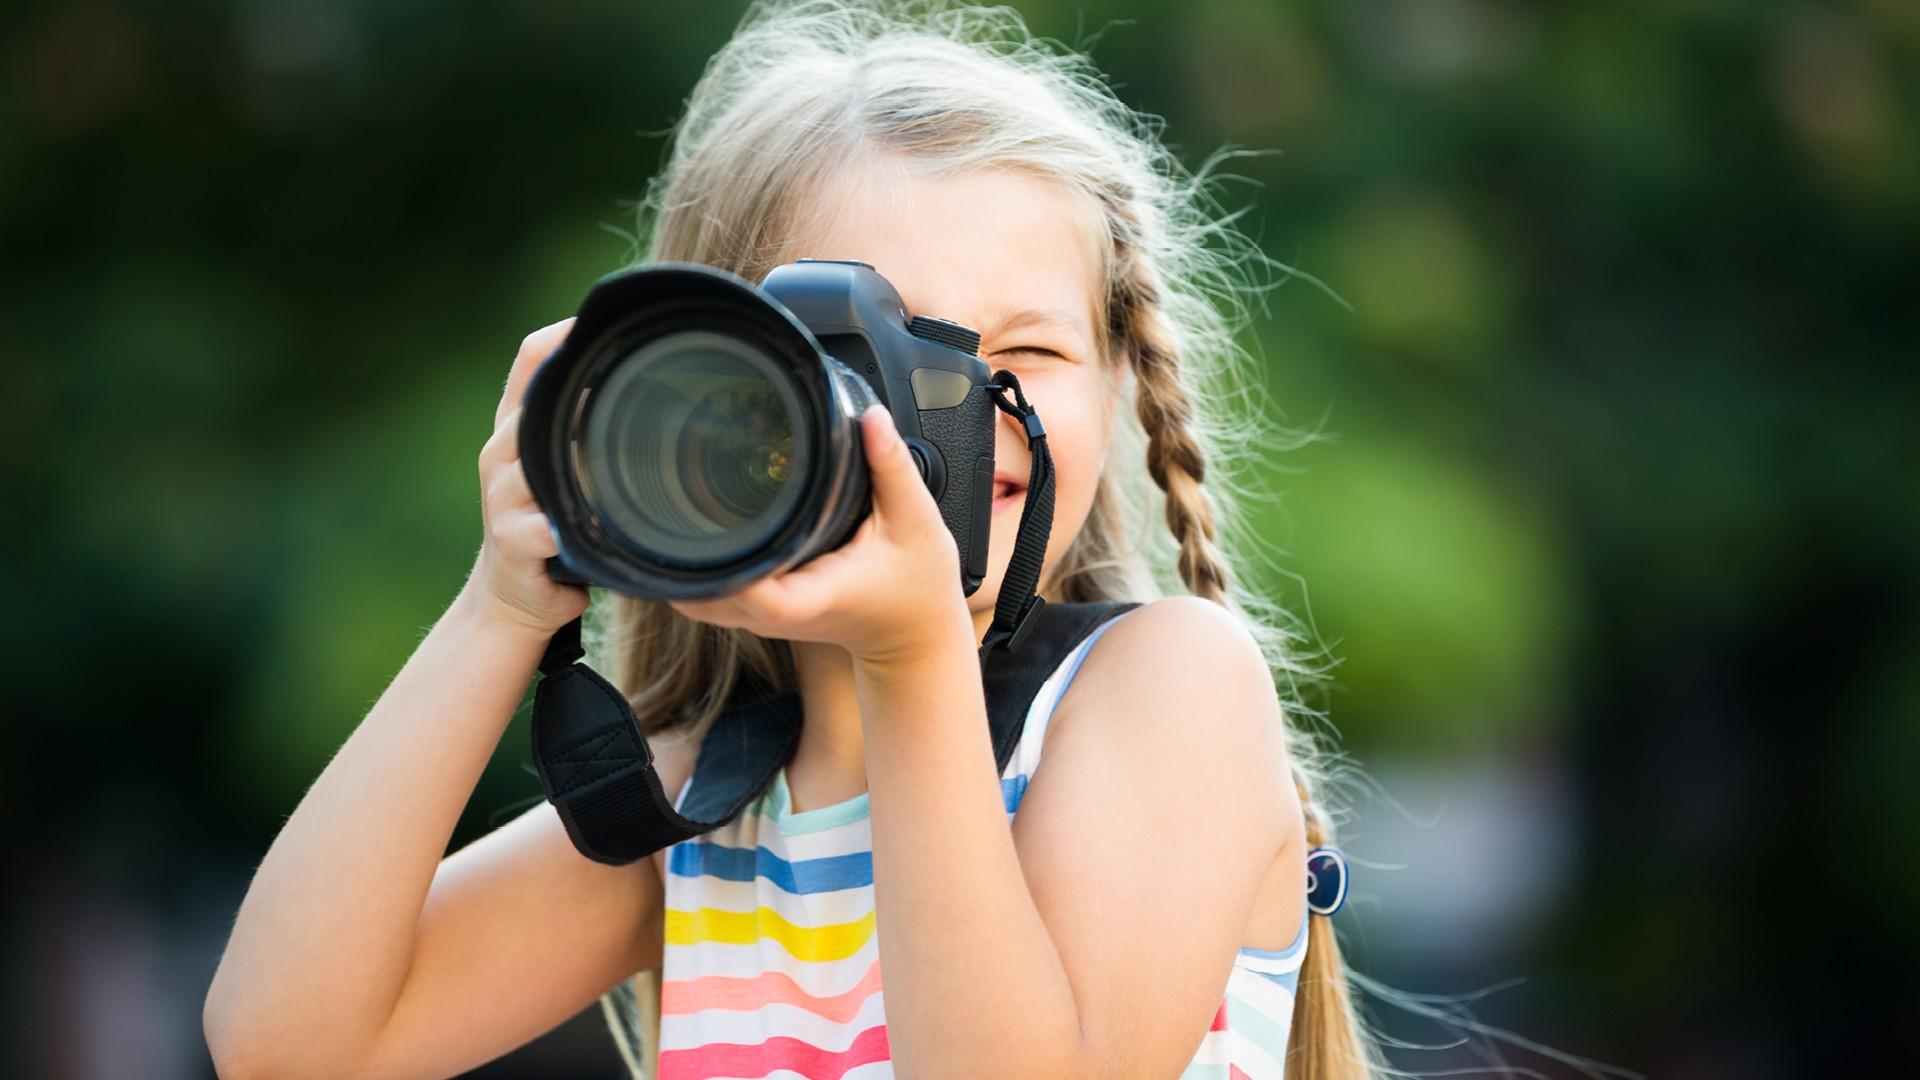 Bambina che fotografa